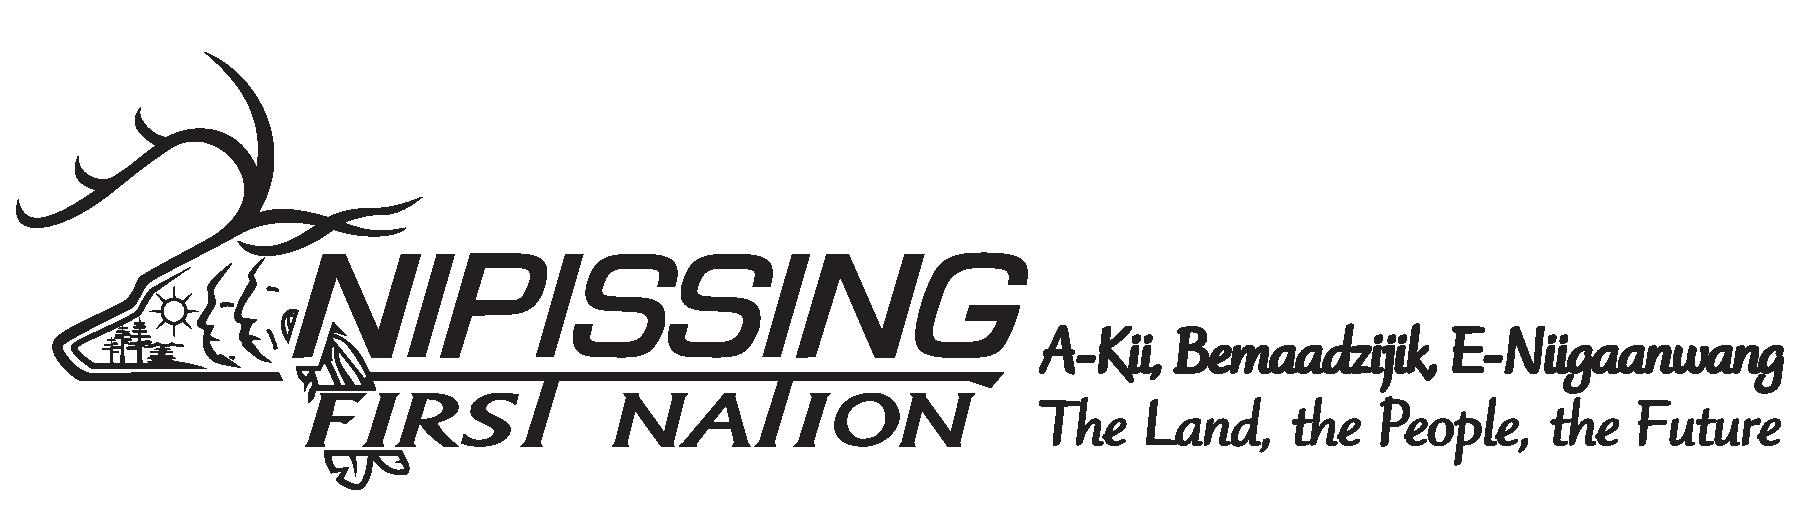 Nipissing First Nation